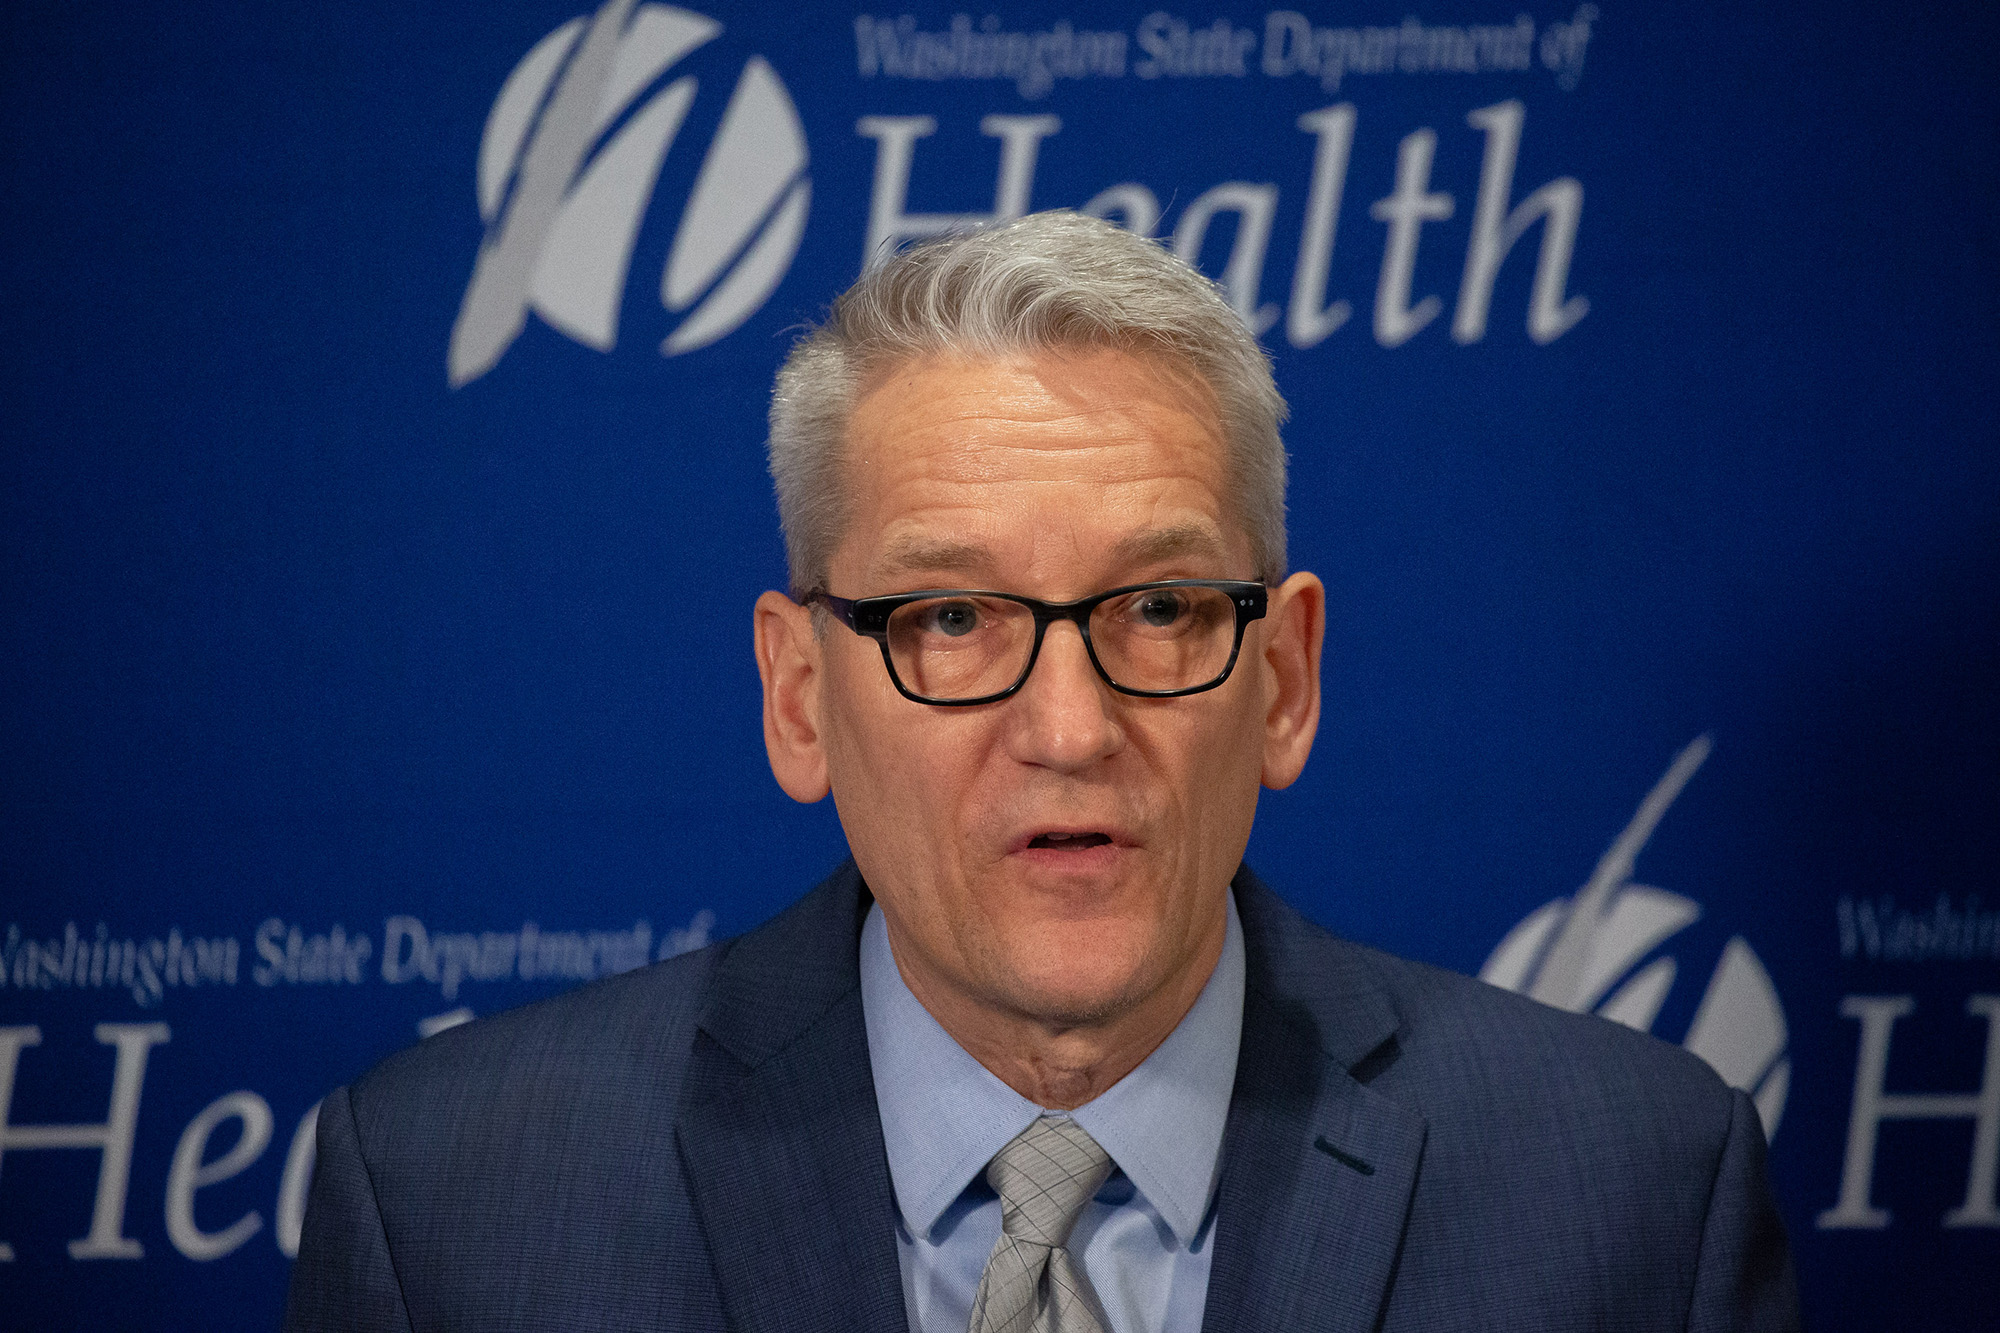 Washington state Secretary of Health John Wiesman speaks during a press conference on January 21, in Shoreline, Washington.